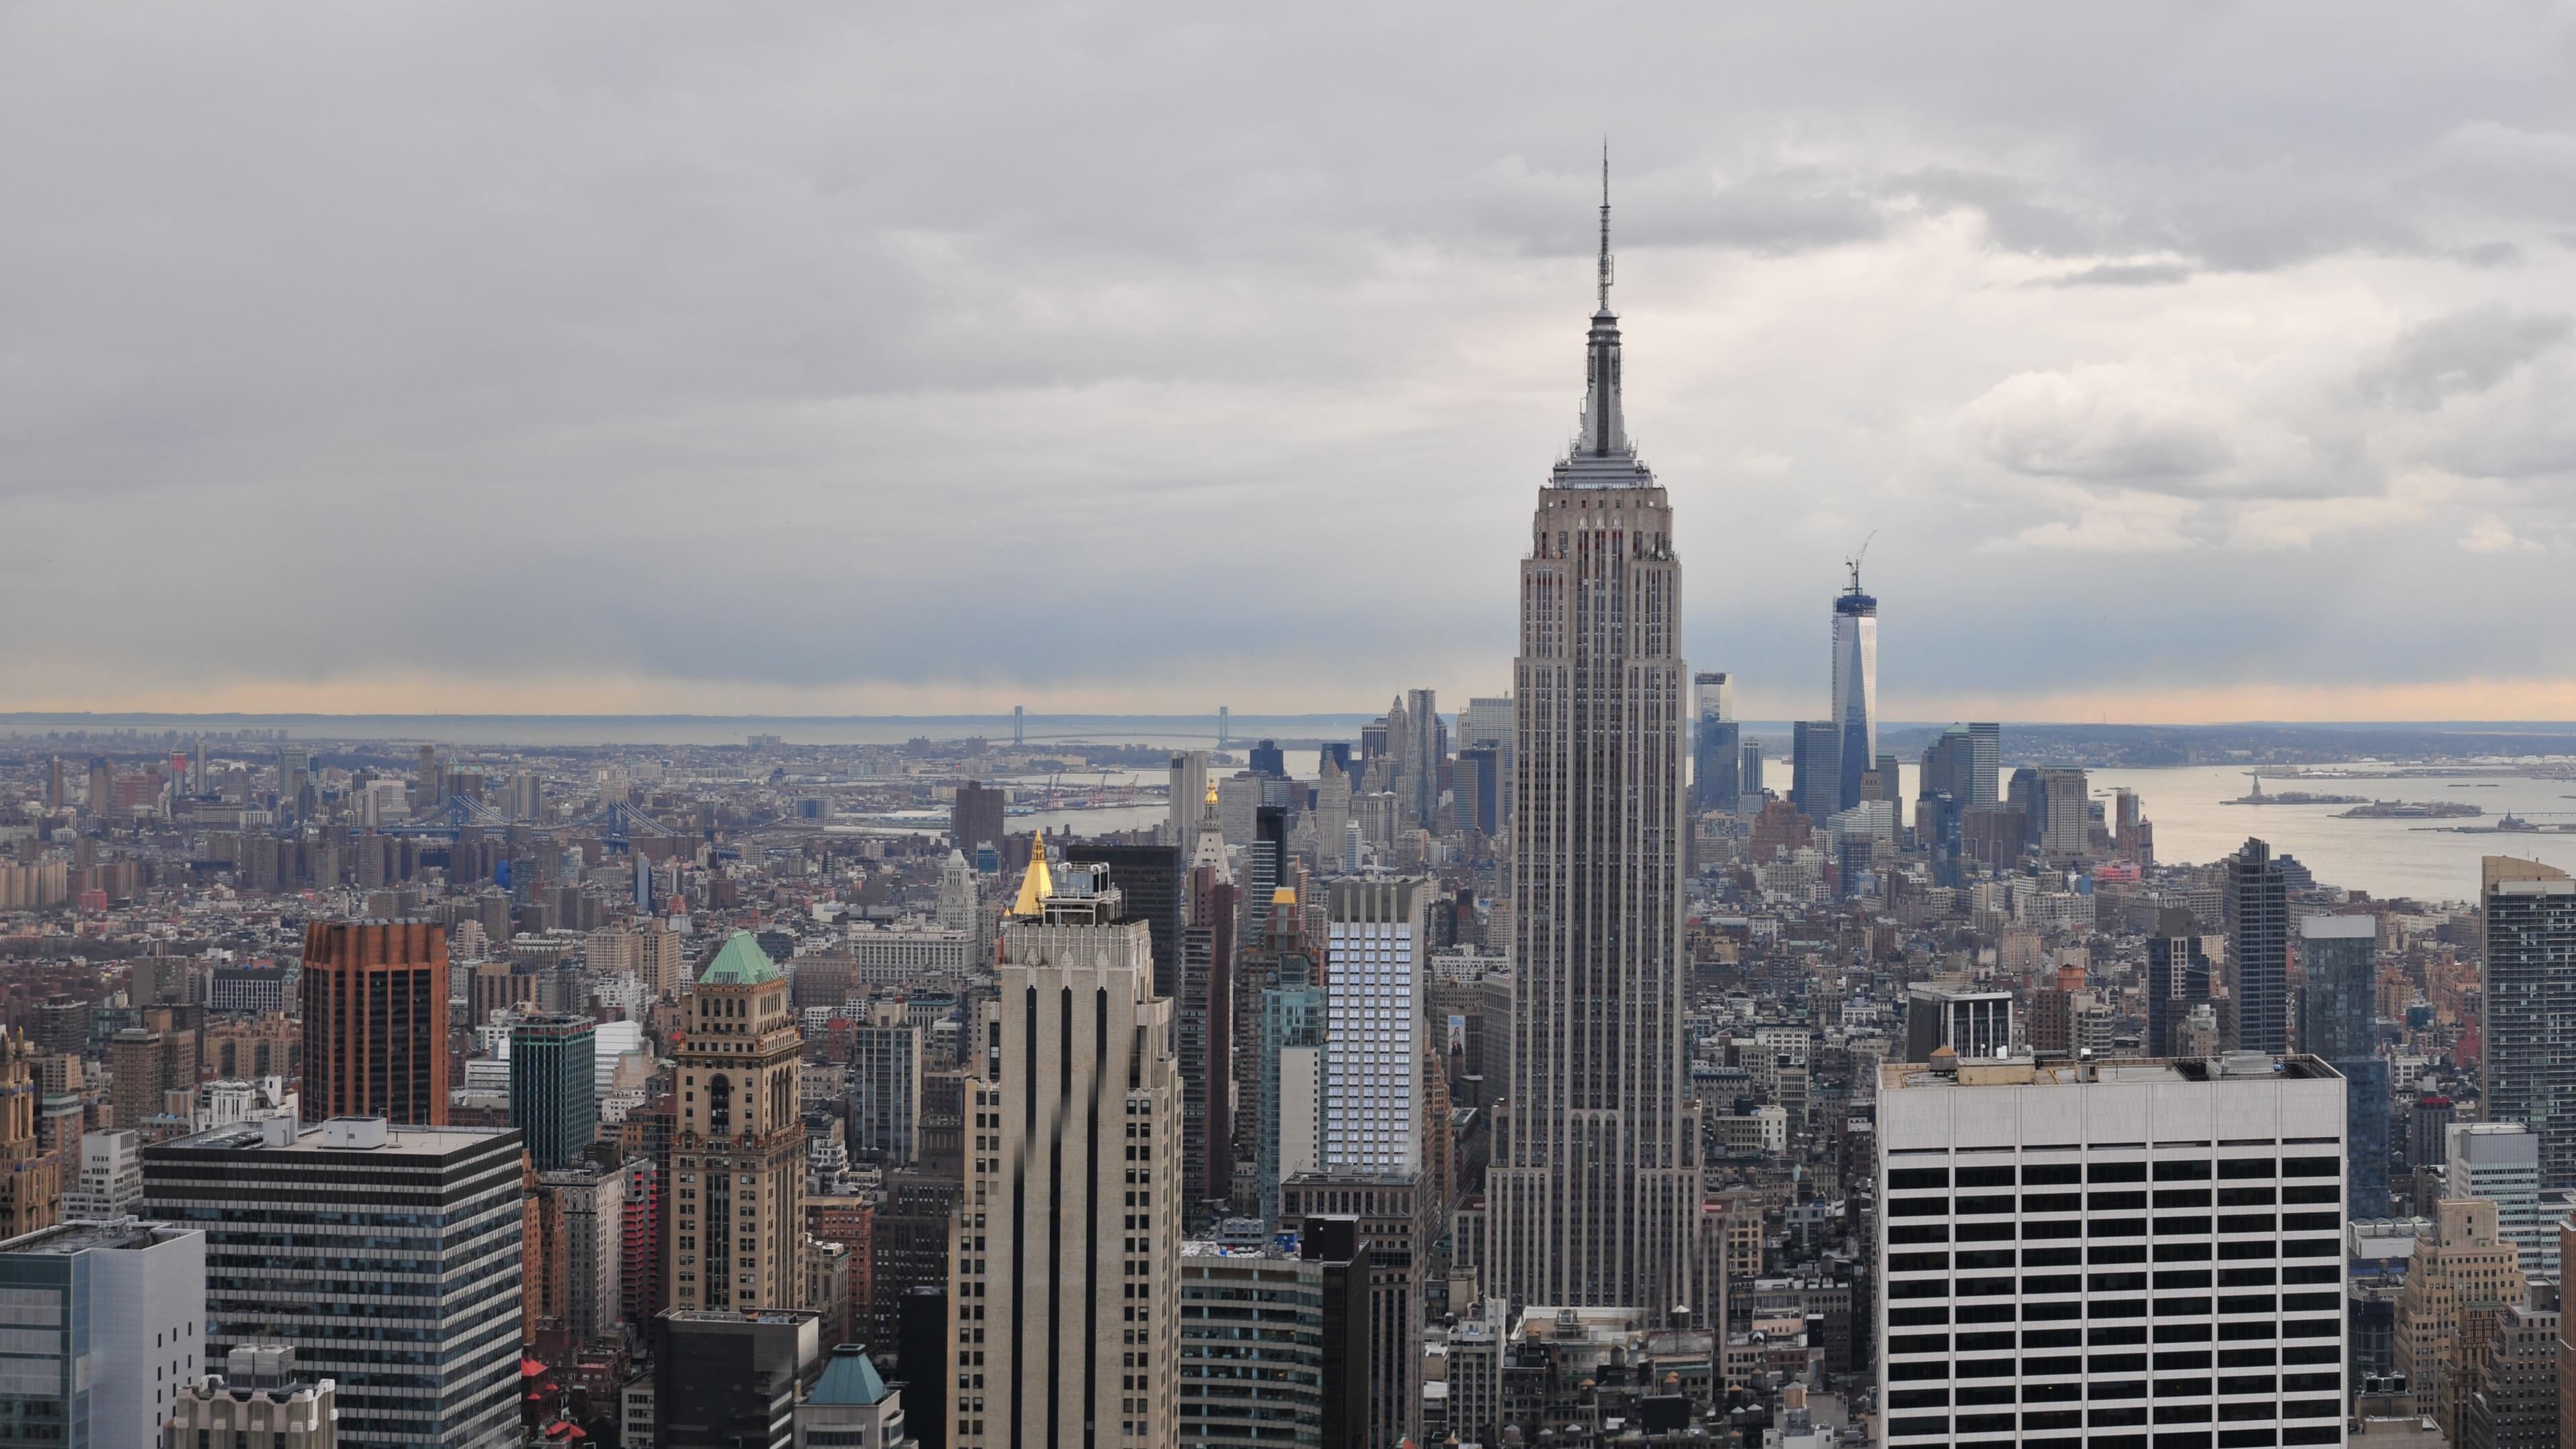 Manhattan & The Empire State Building wallpaper